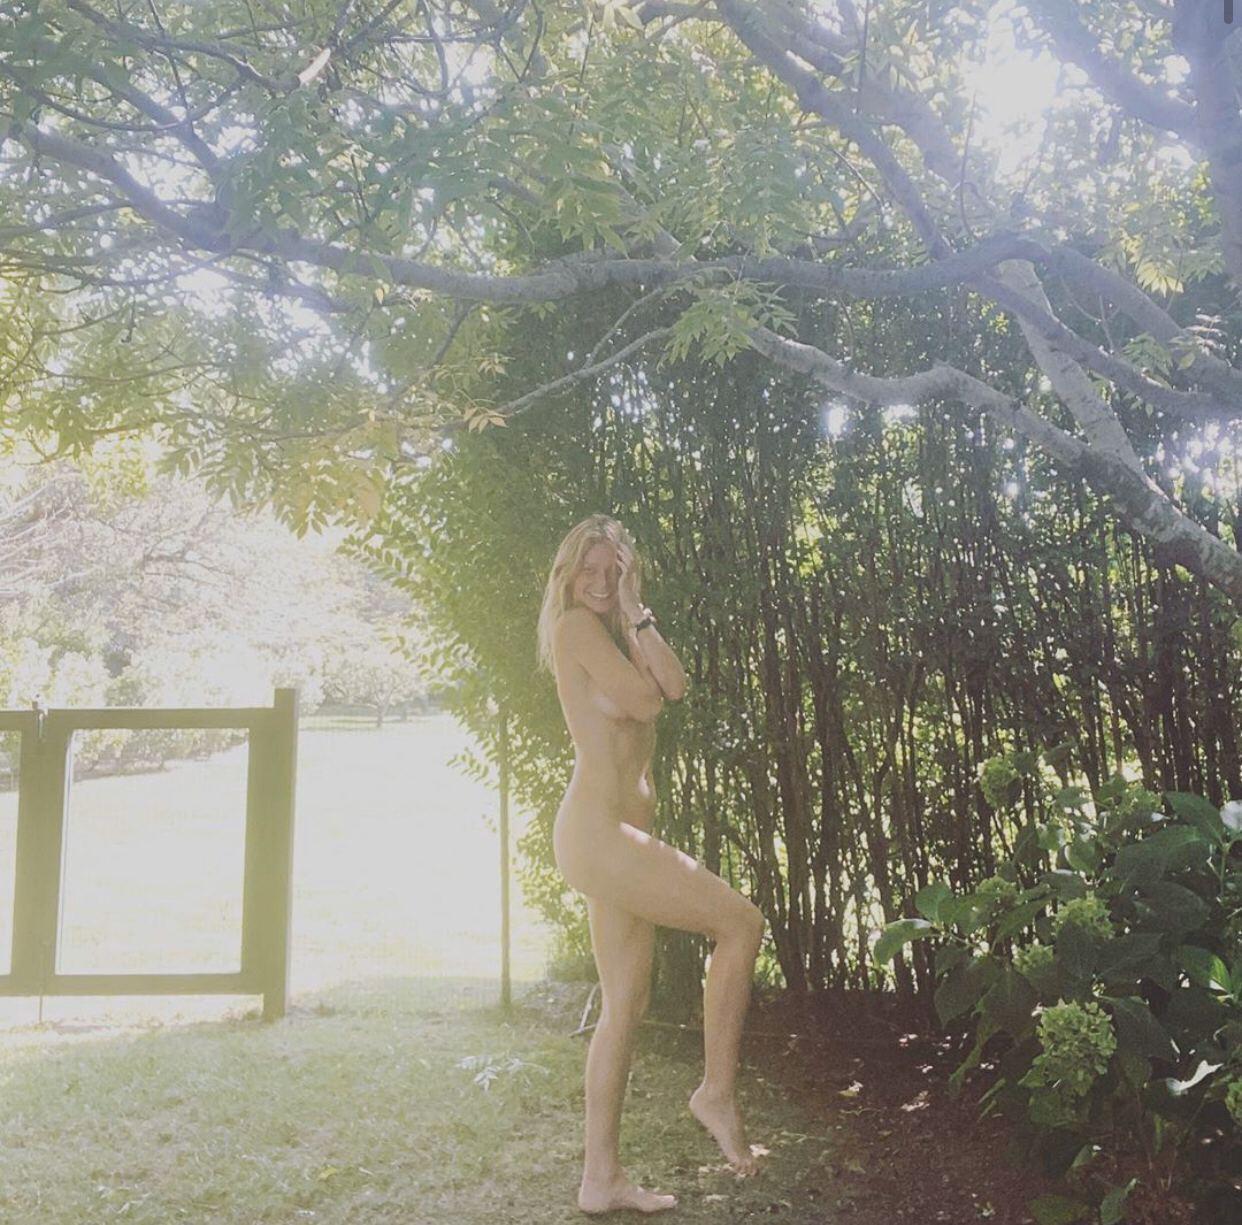 Гвинет Пэлтроу. Источник: https://www.instagram.com/gwynethpaltrow/